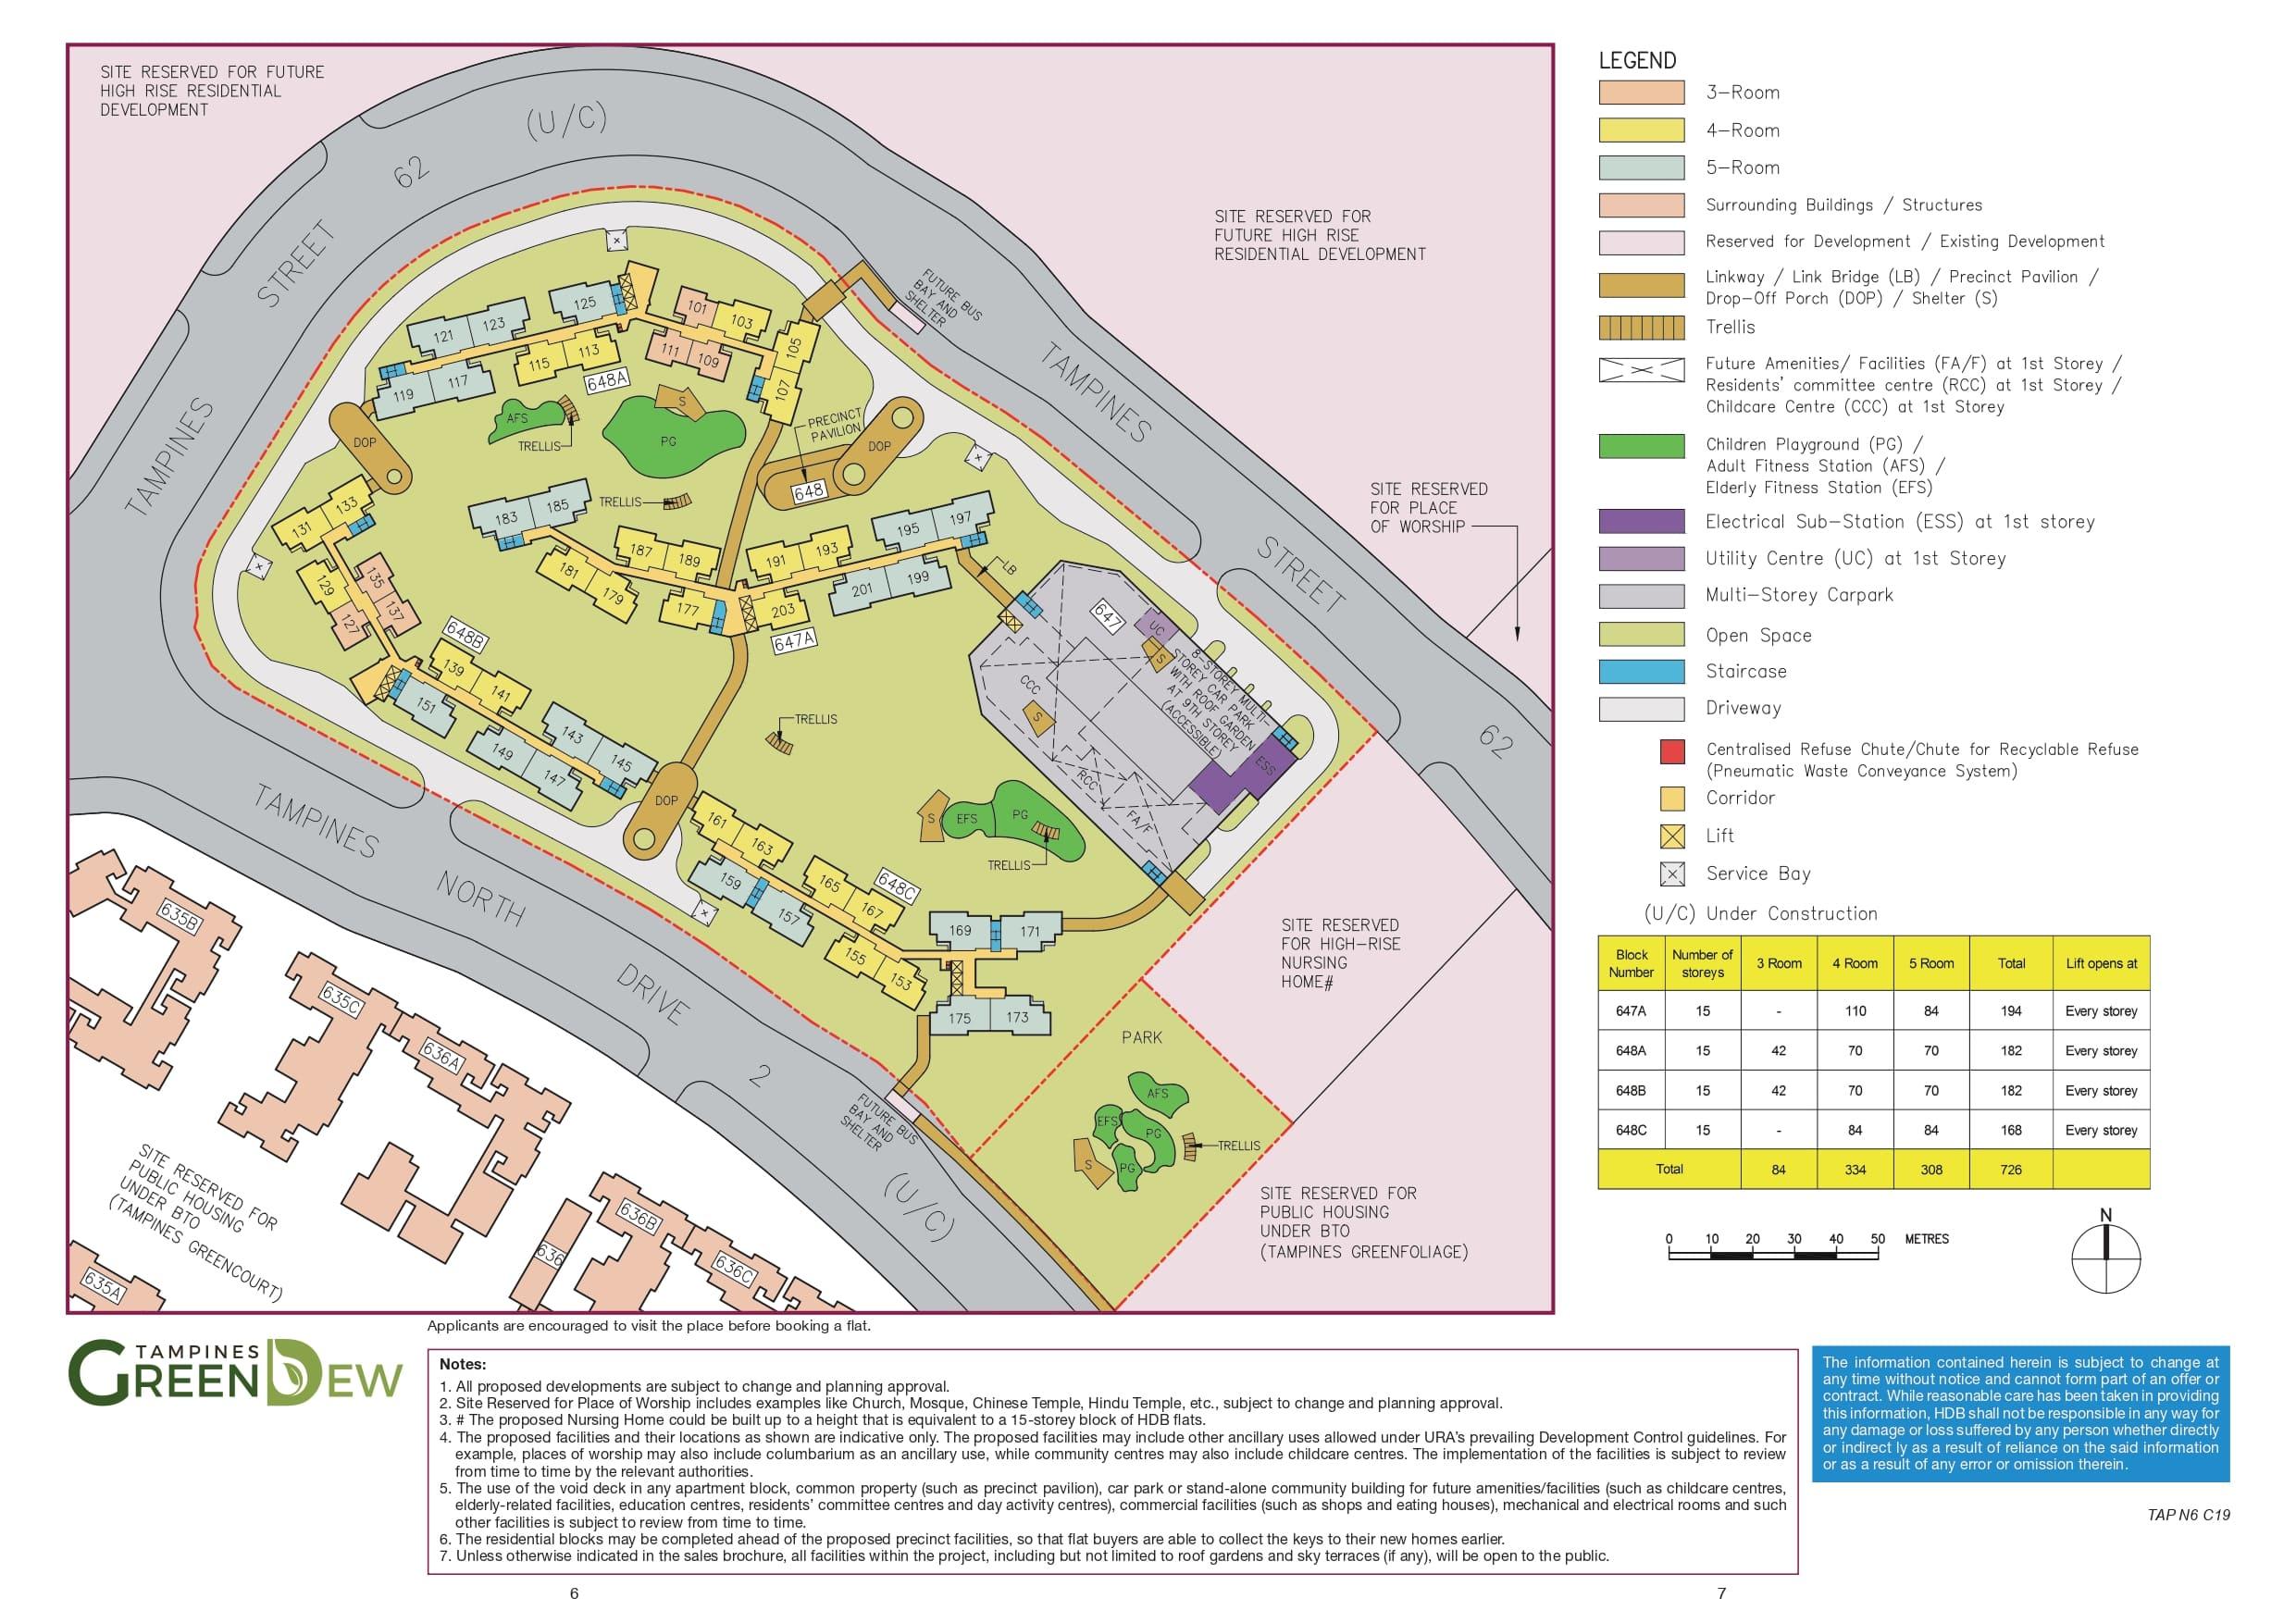 Tampines GreenDew Site Plan